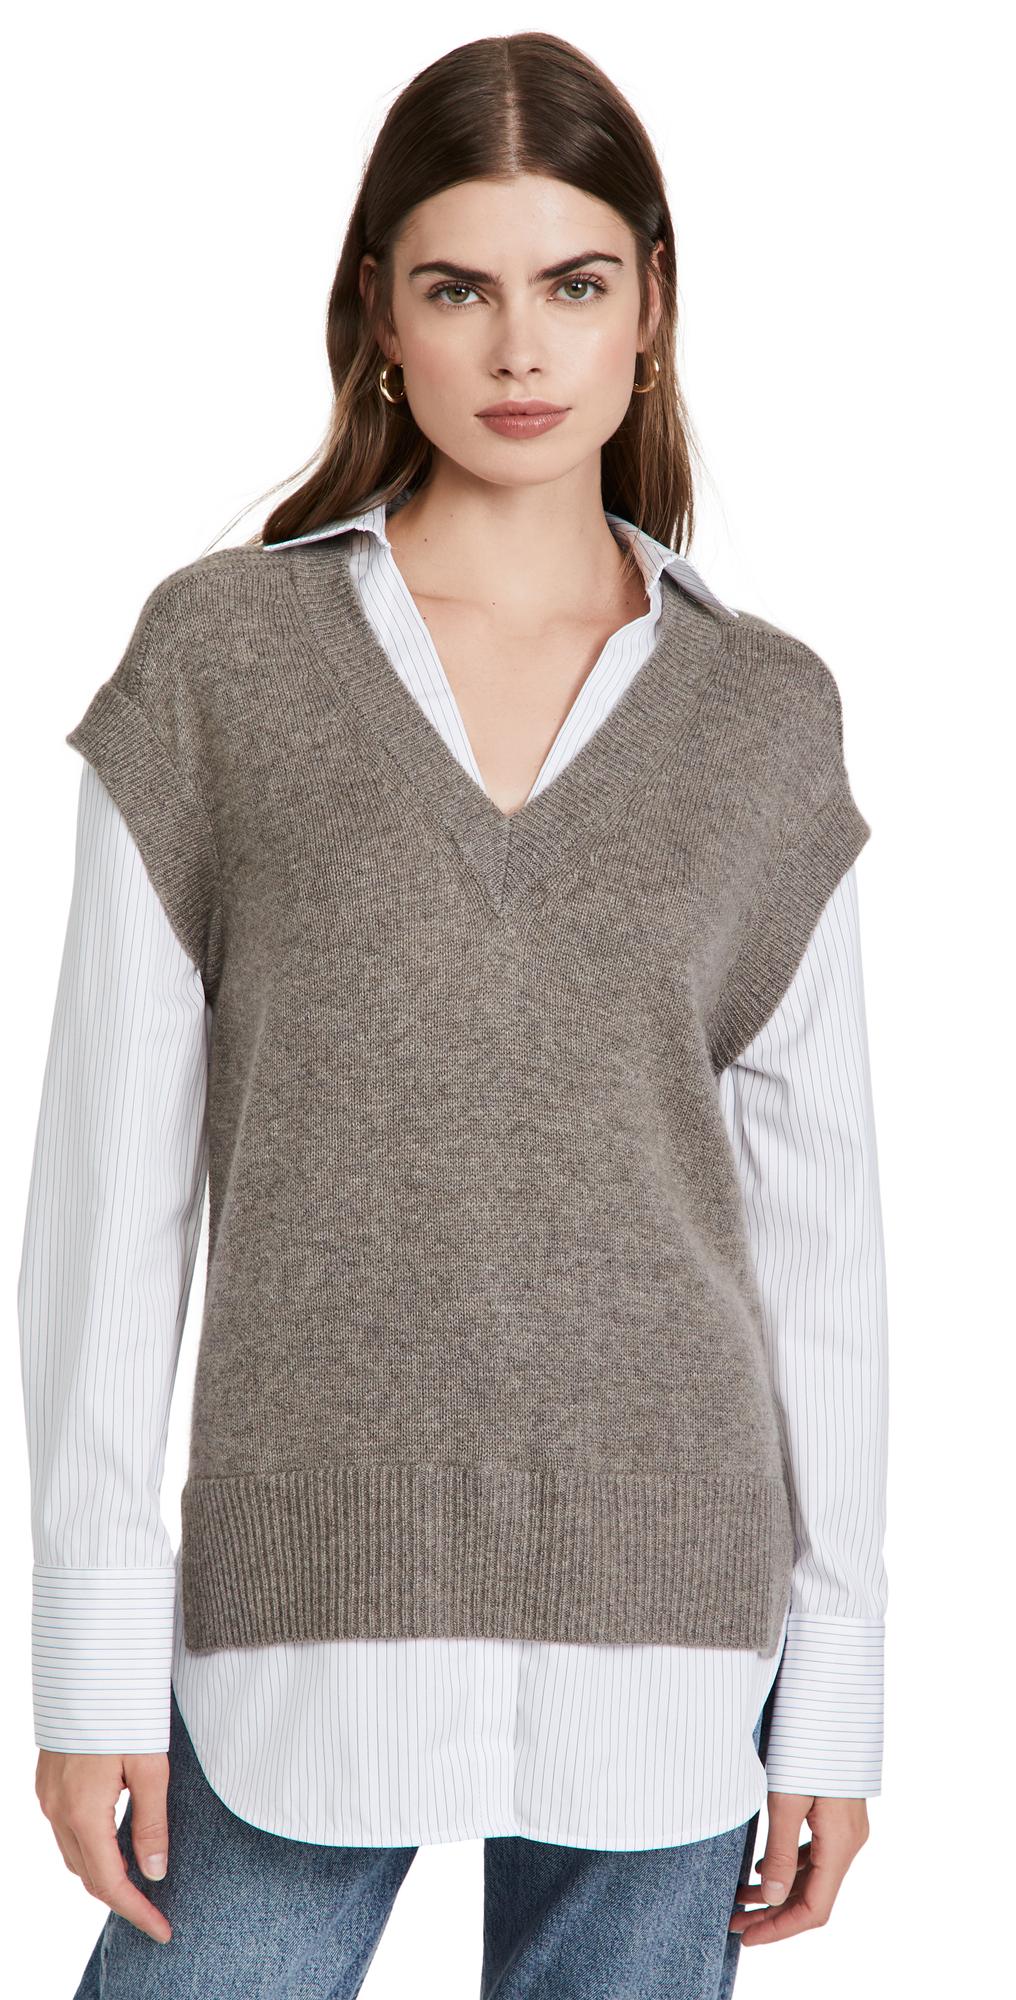 Nye Vest Layered Looker Shirt